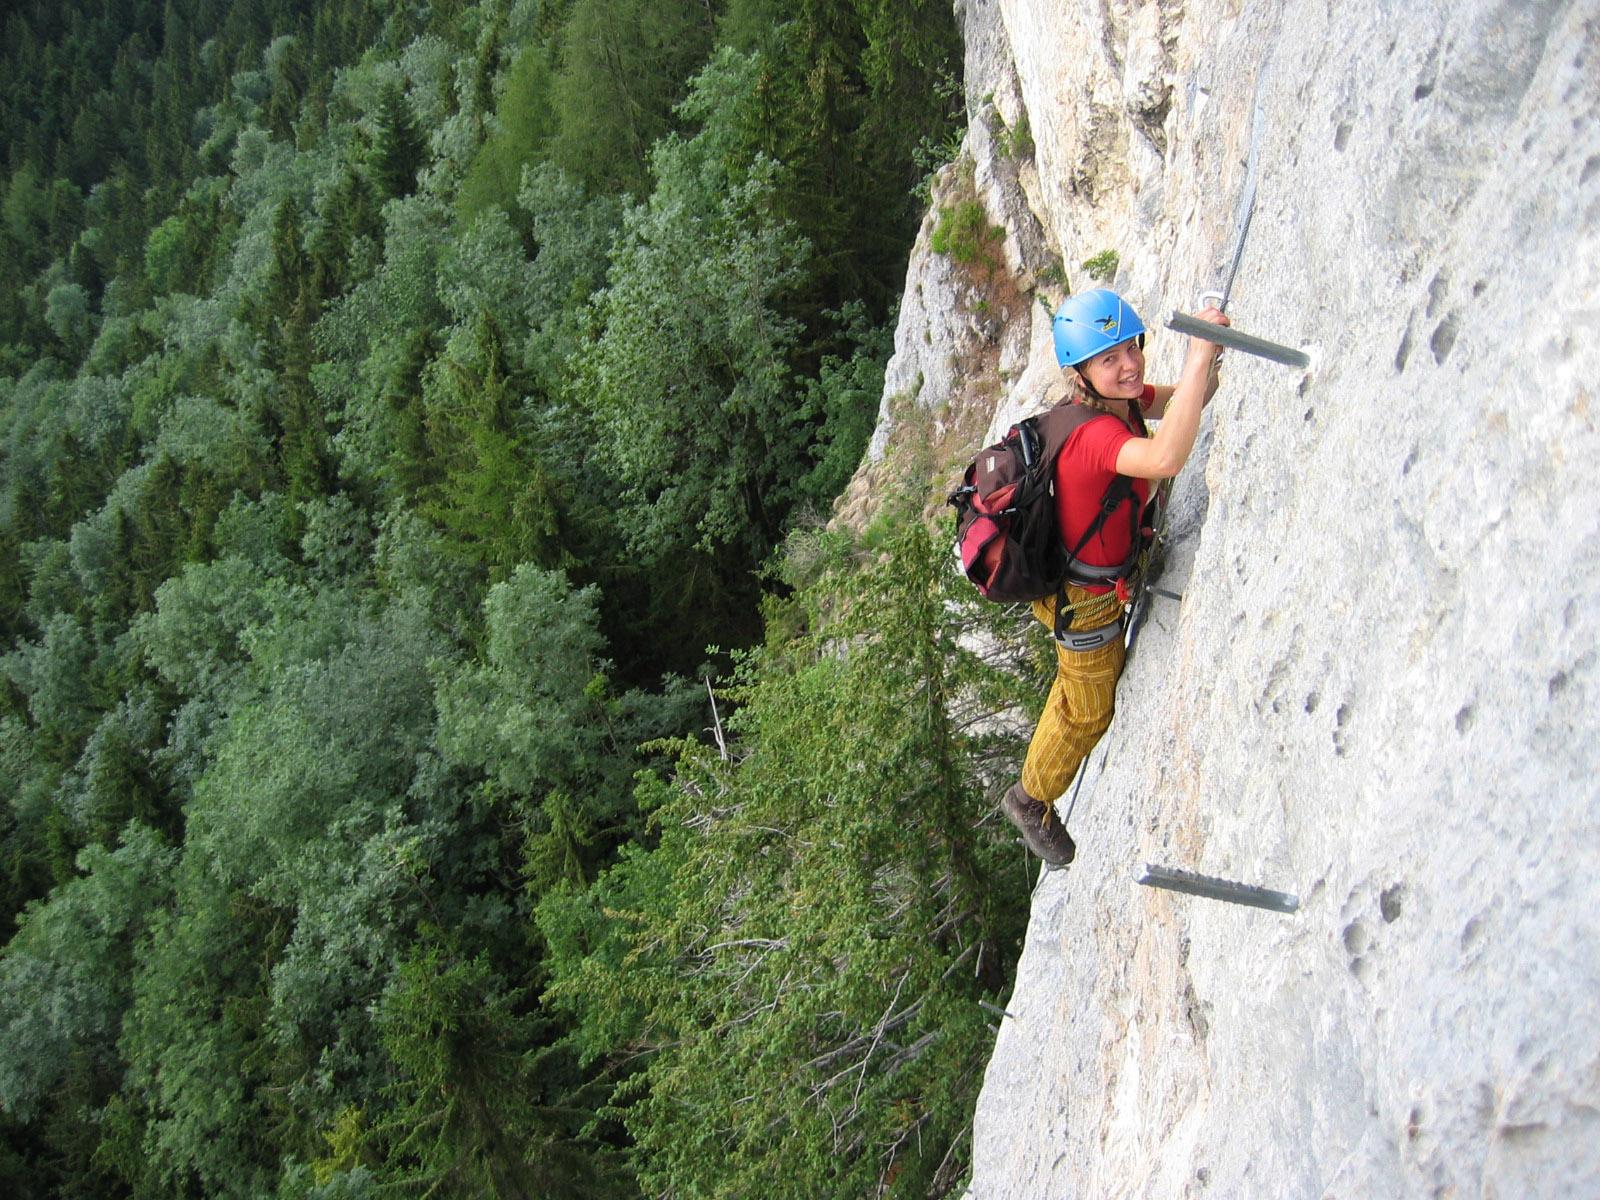 Via Kessi Klettersteig : Bernis bergzauber im internetz kapf m über via